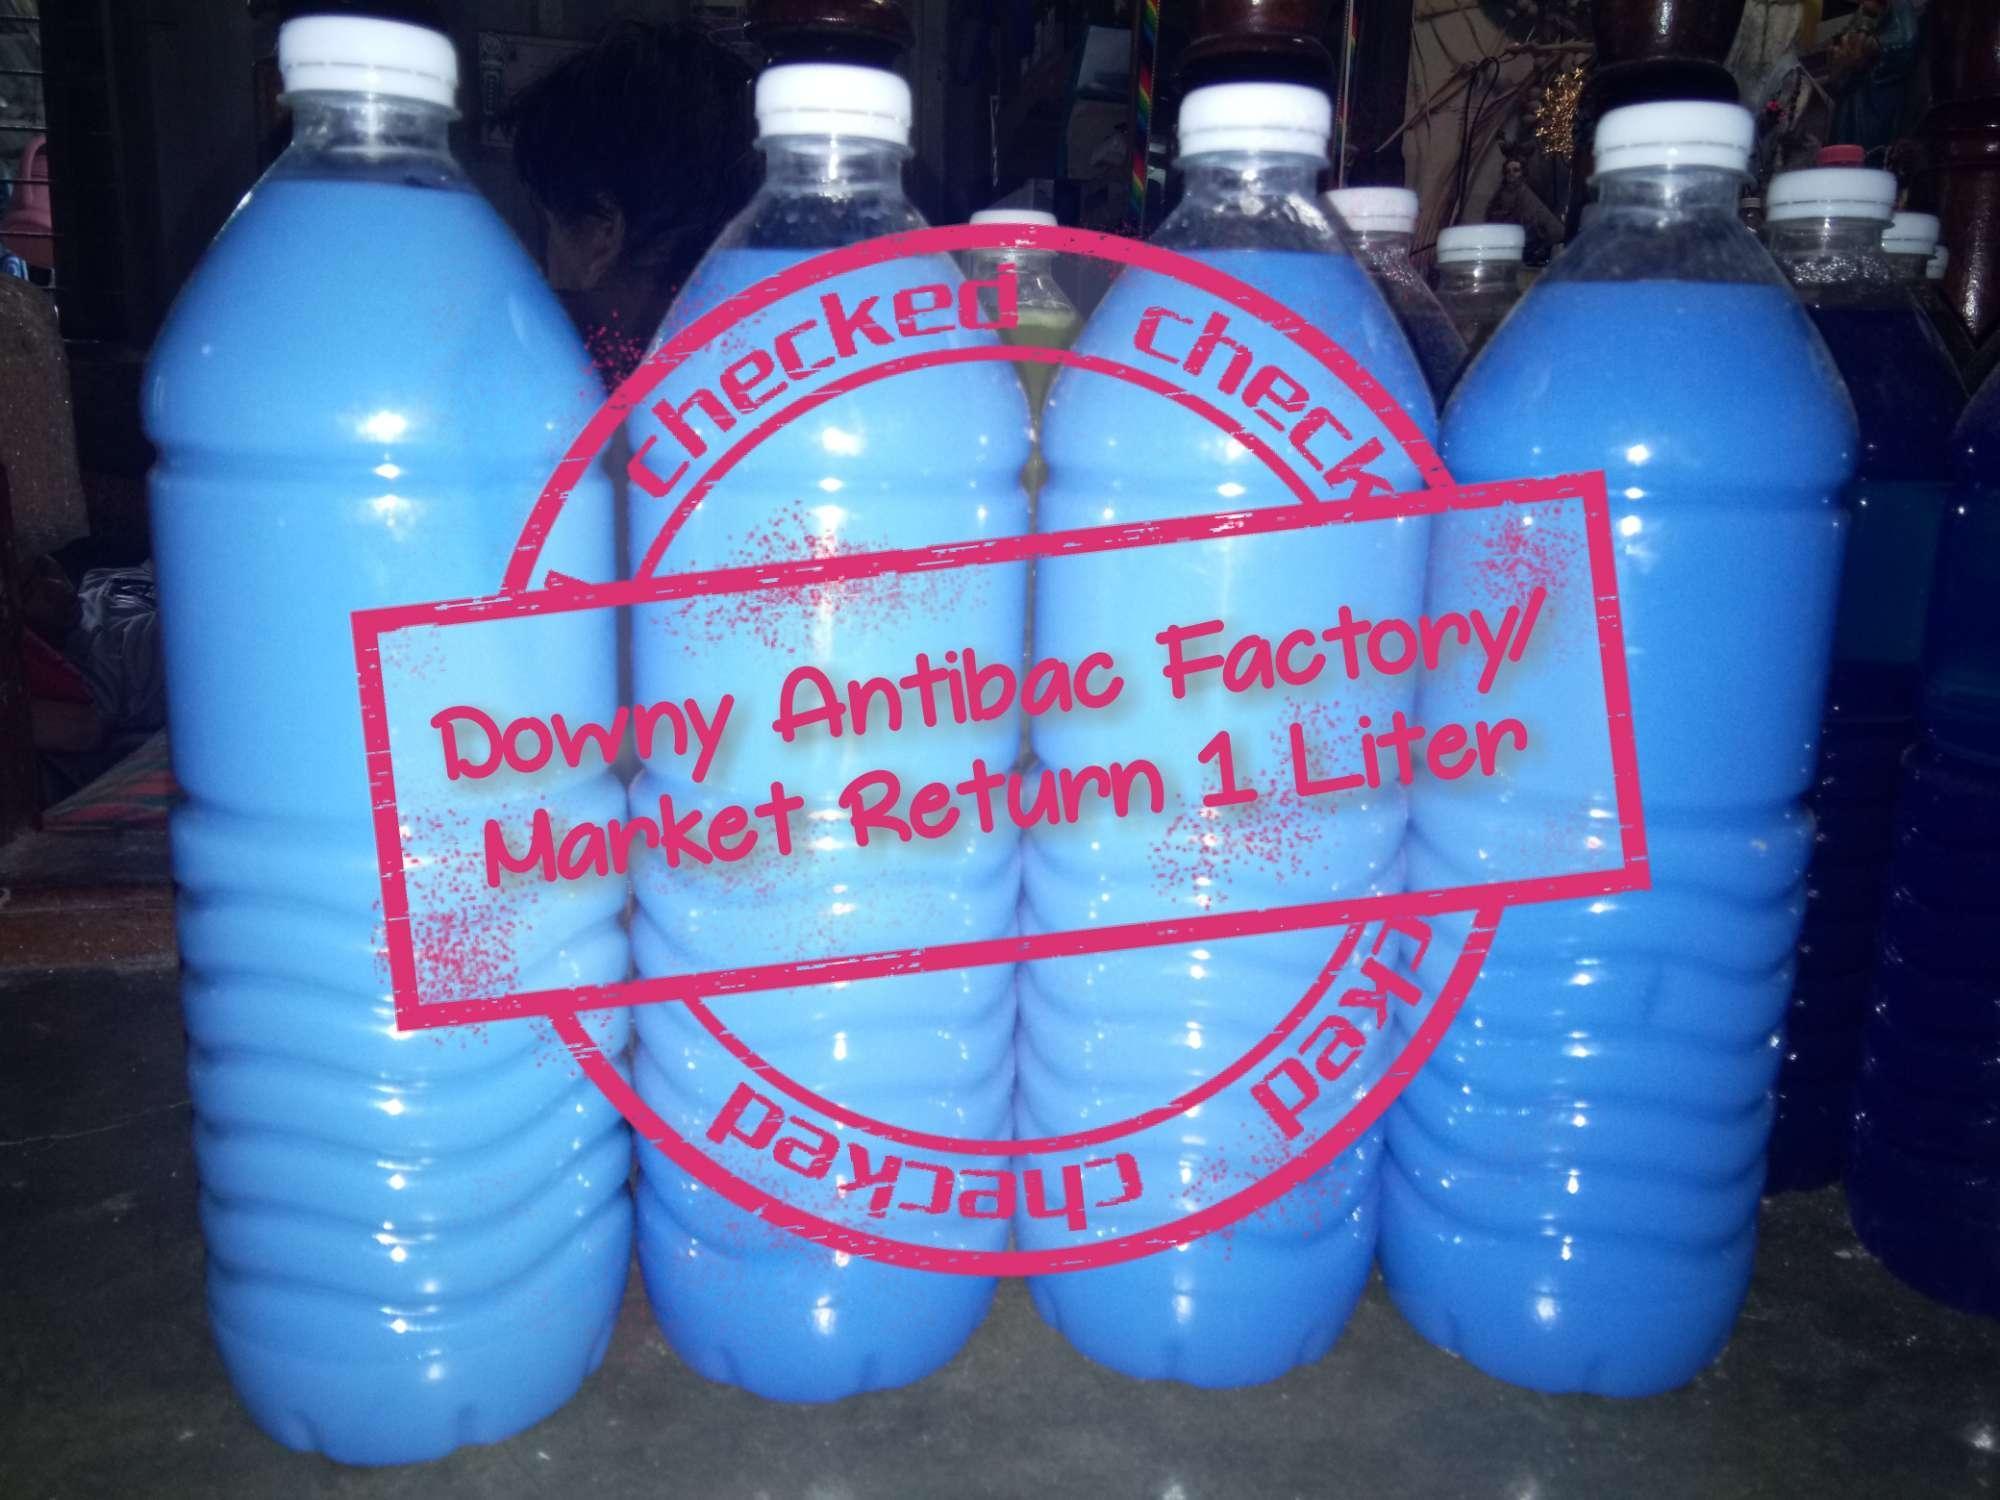 Downy Philippines Price List Antibac Fabric Conditioner Pewangi Pakaian 16l Refill Factory Return 1liter